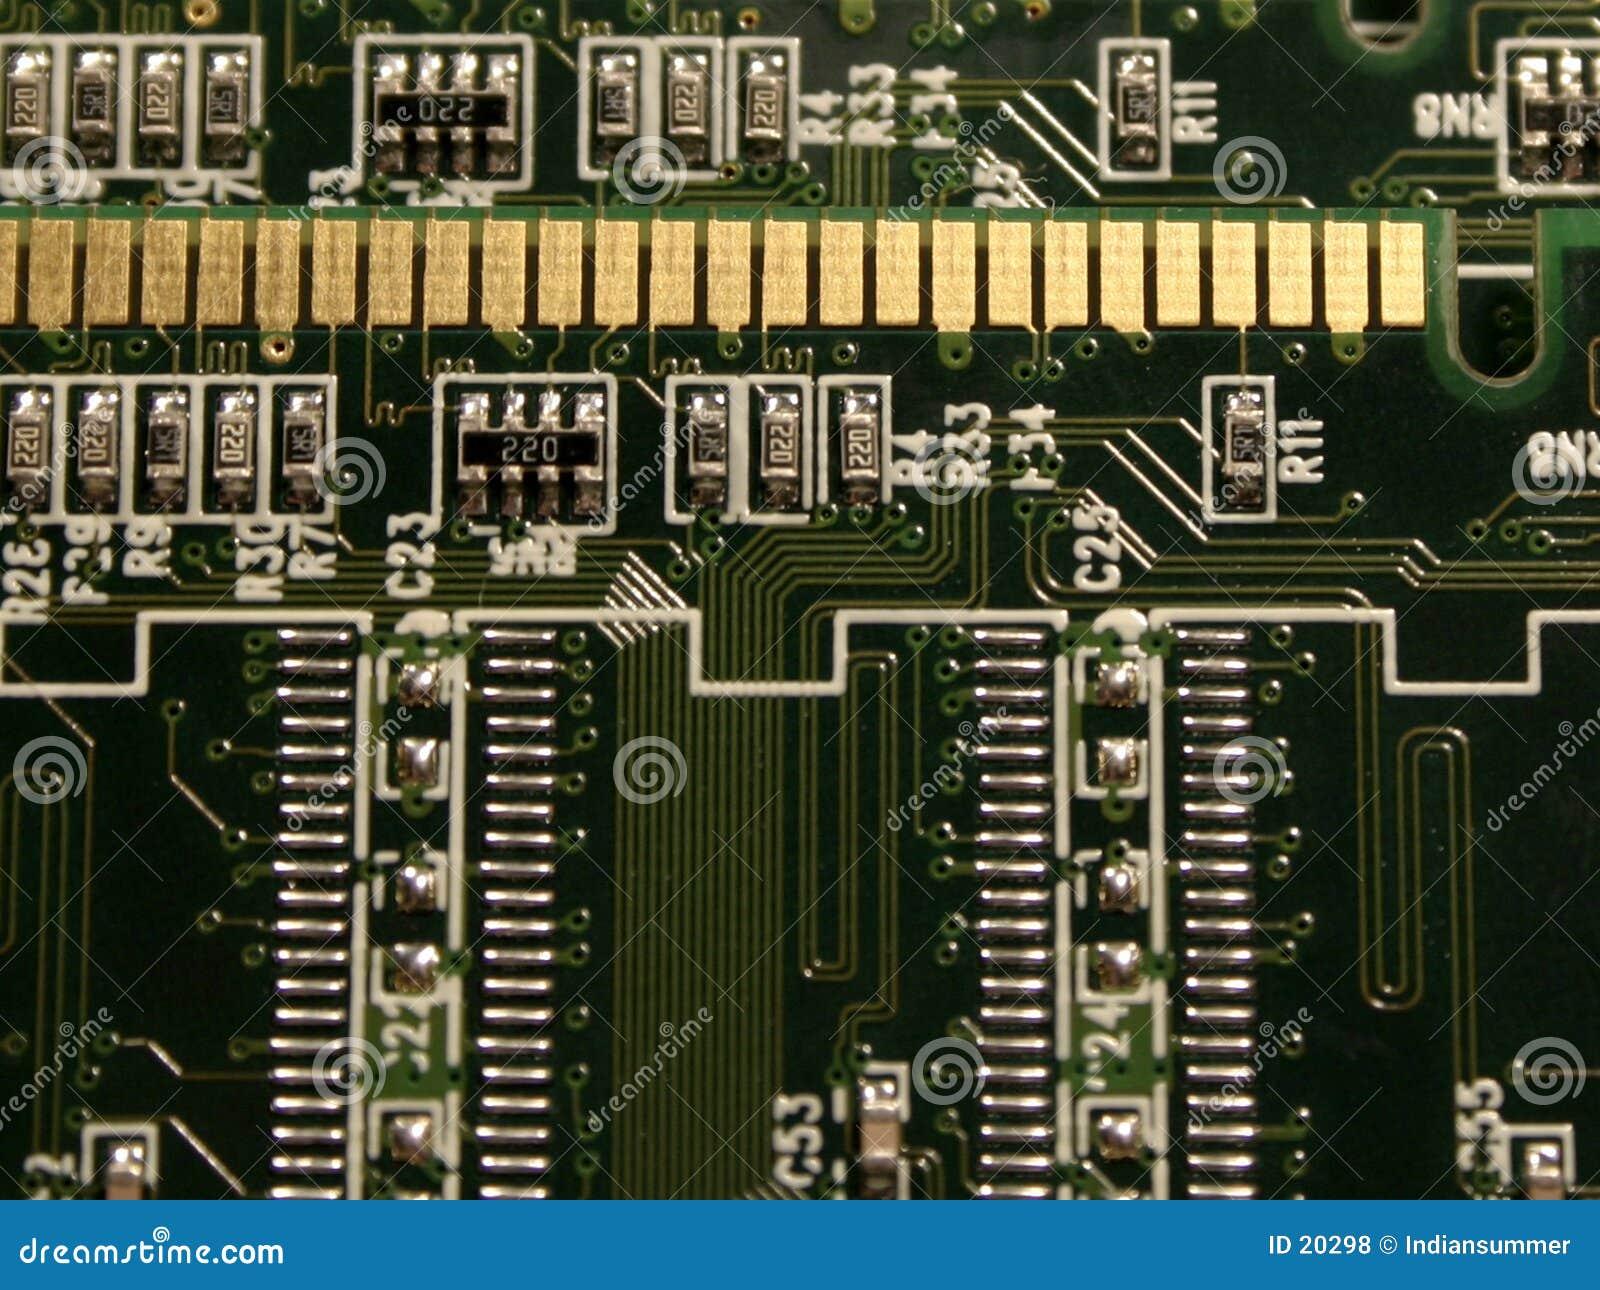 Computer memory modules II